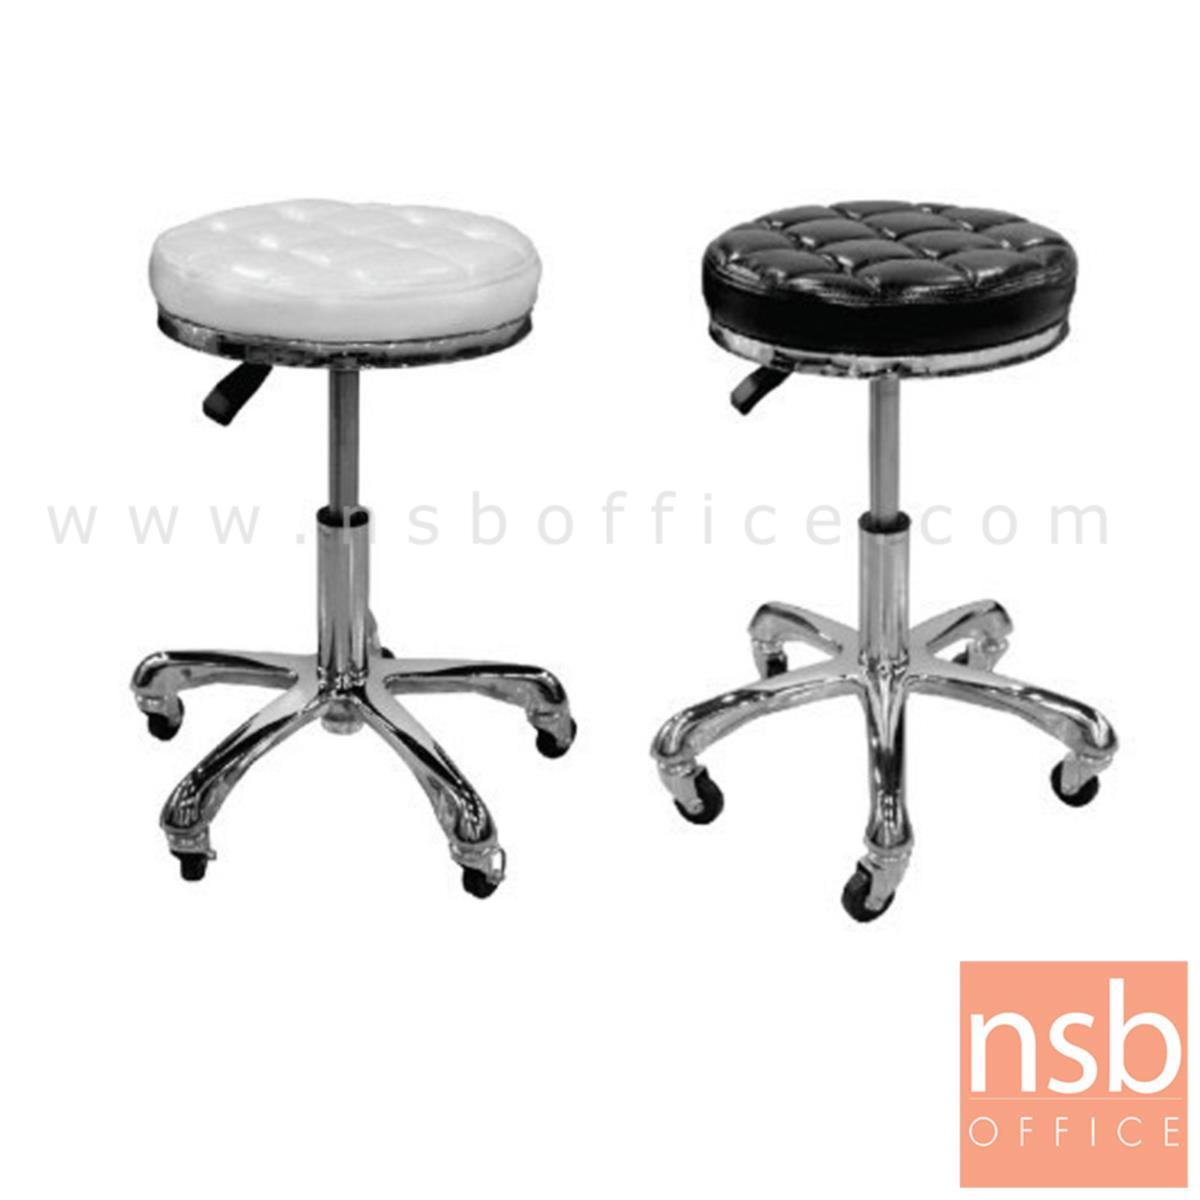 B09A213:เก้าอี้โมเดิร์น รุ่น Gabriel (เกเบรียล)   ขาโครเมี่ยมล้อเลื่อน